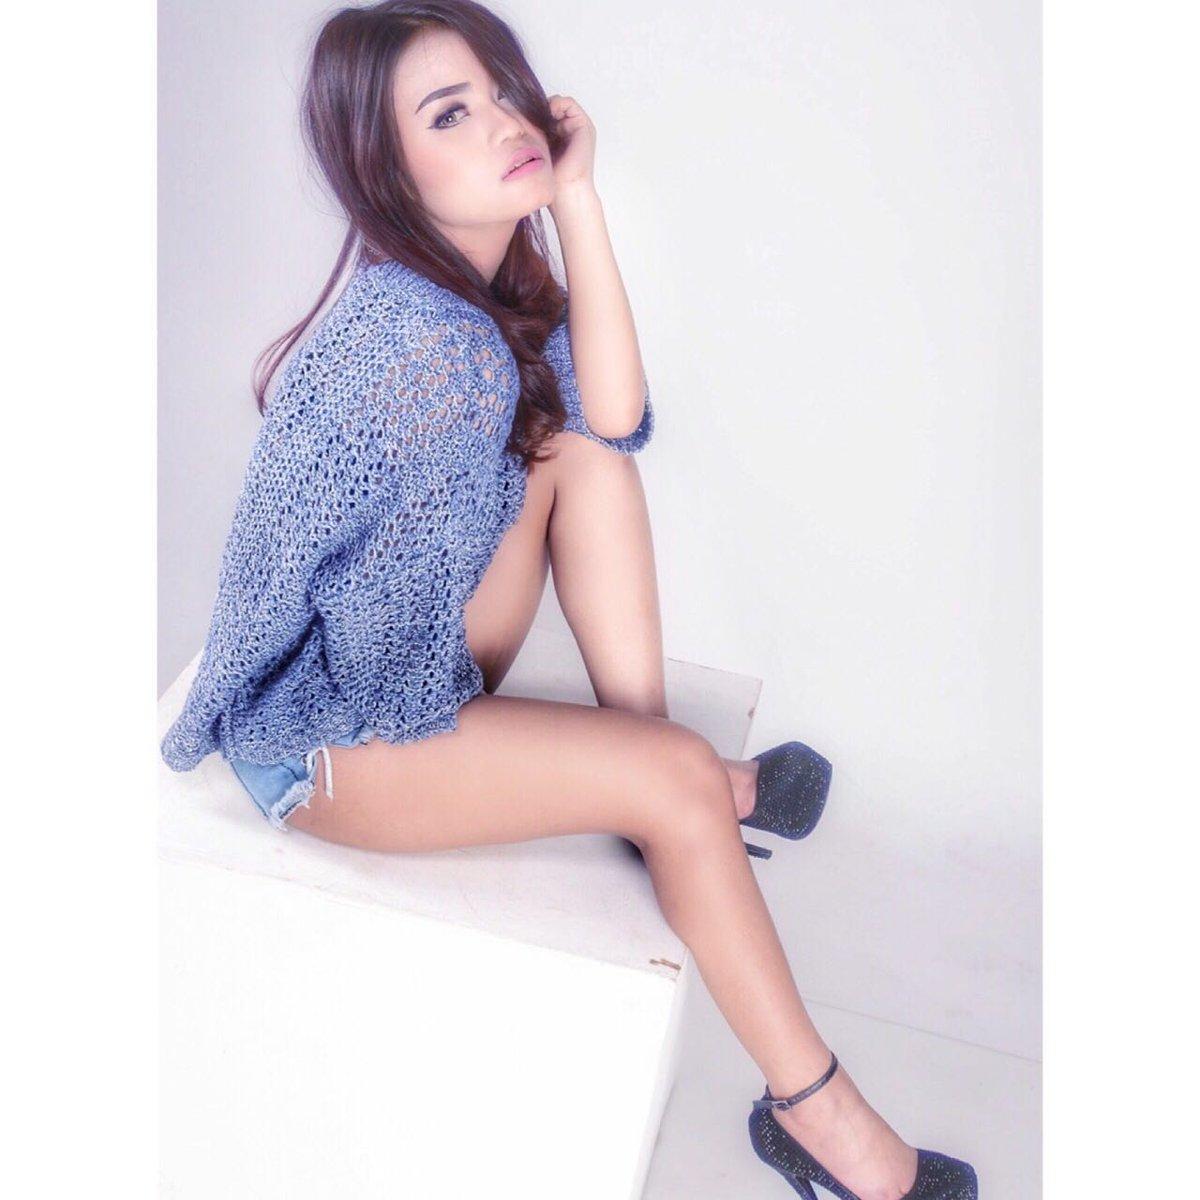 modelseksiindonesia hashtag on Twitter